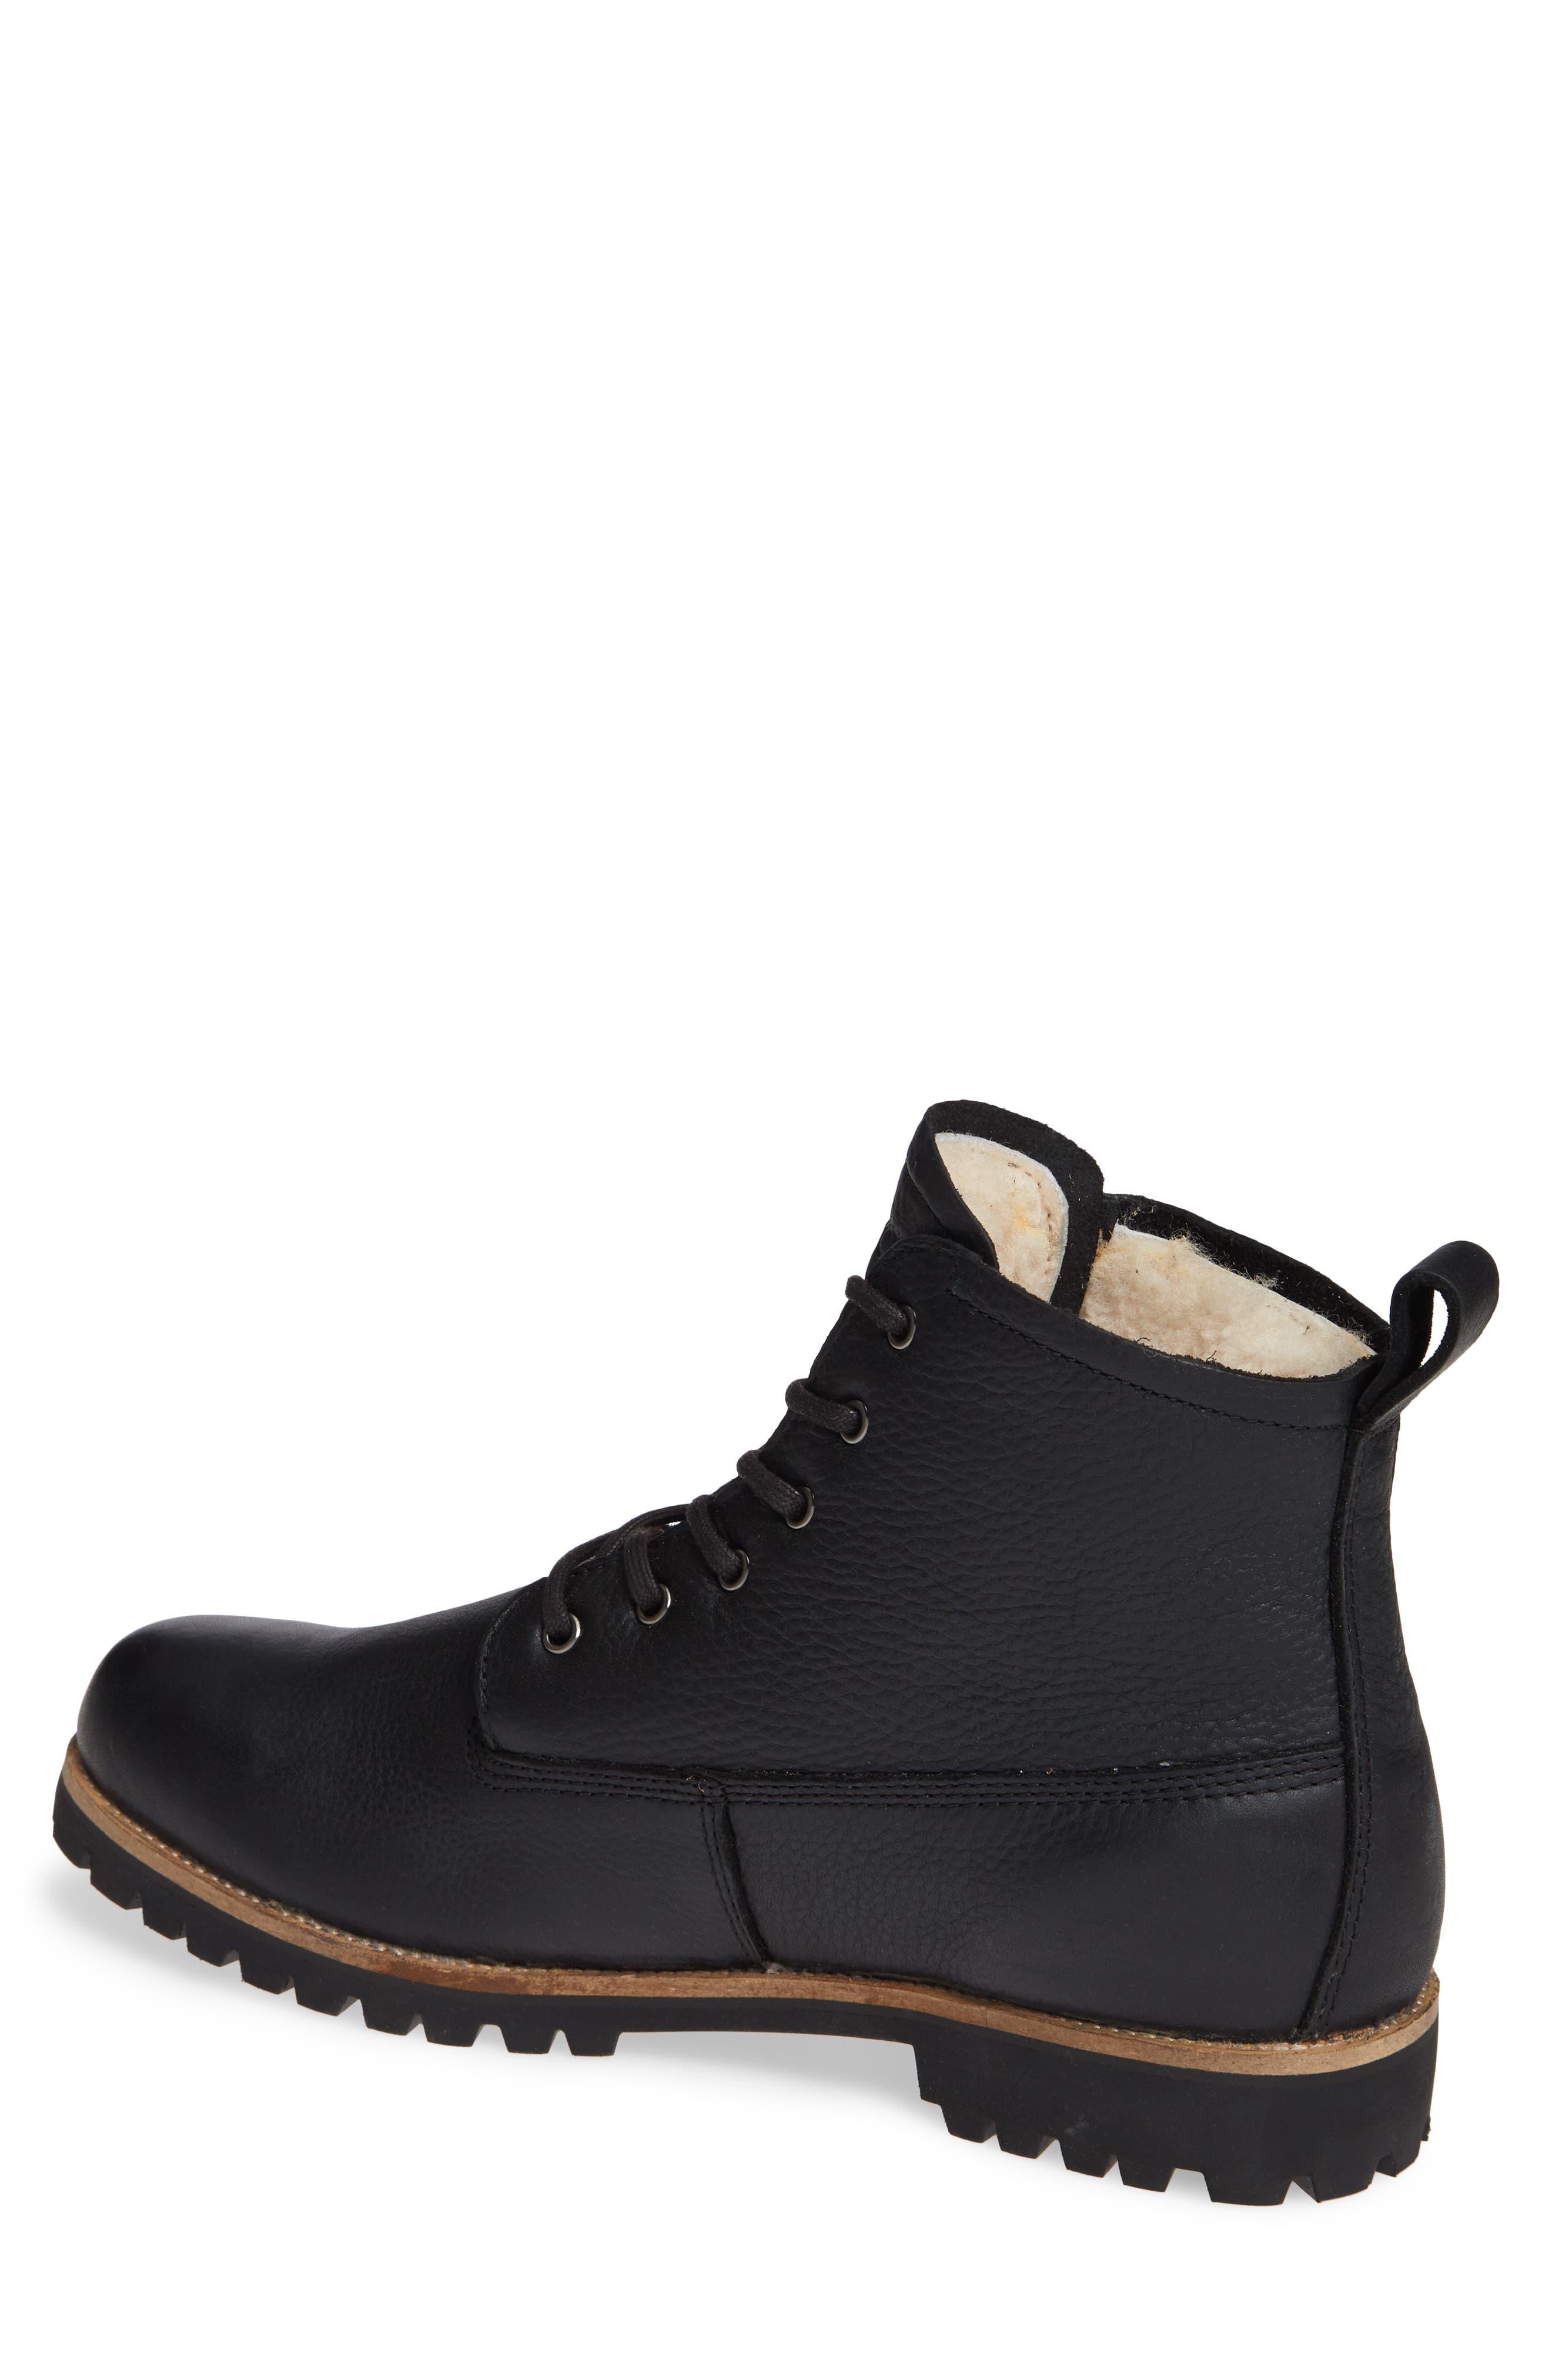 OM60 Waterproof Genuine Shearling Boot,                             Alternate thumbnail 2, color,                             BLACK